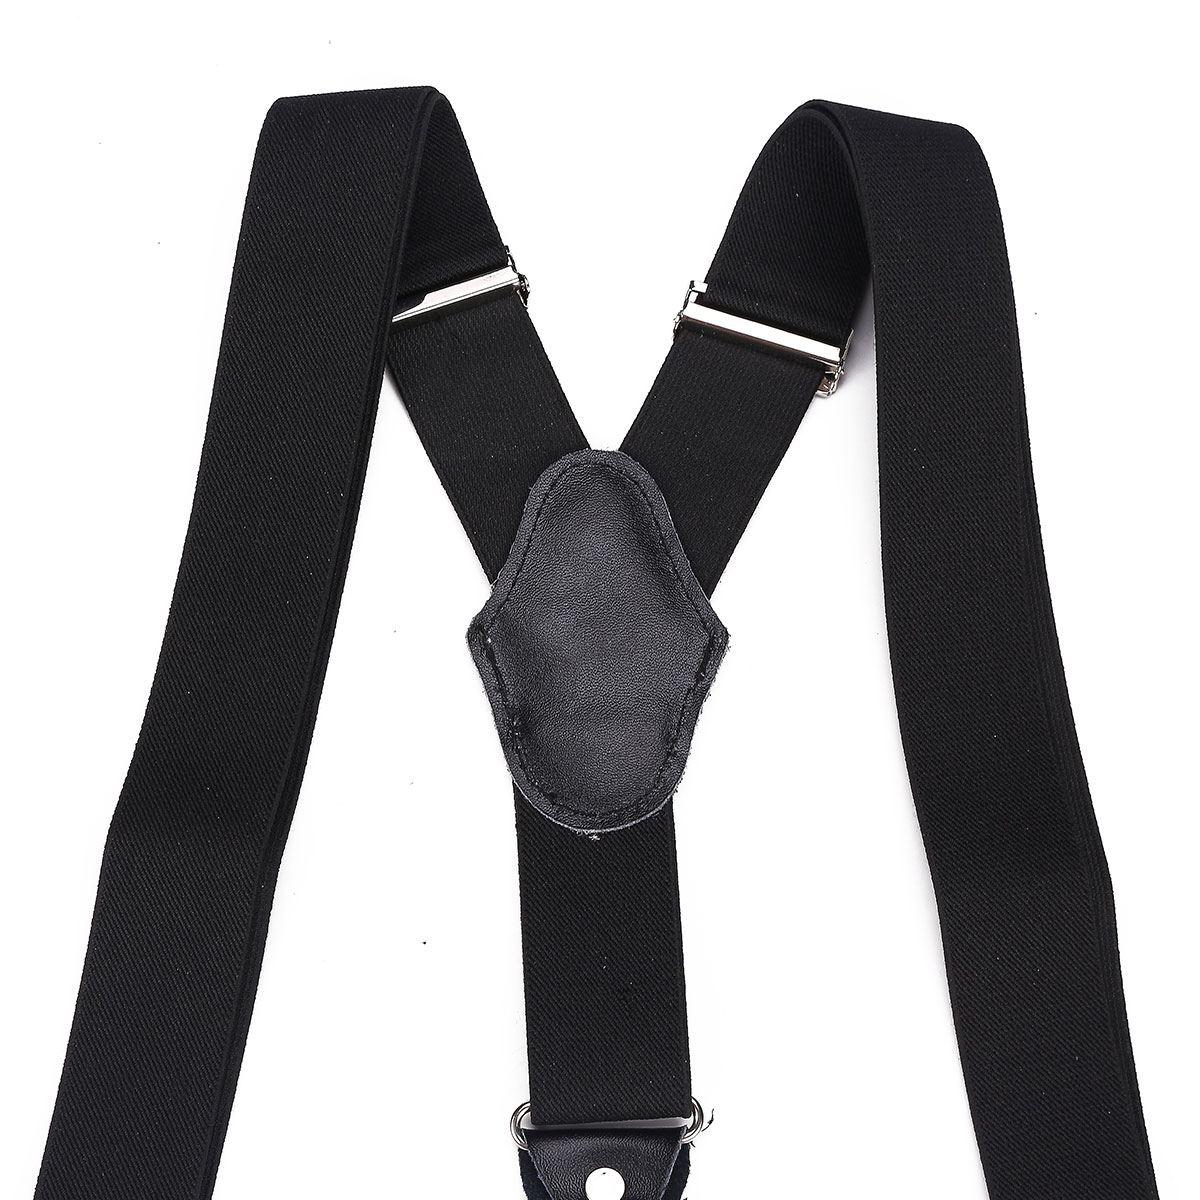 Hot Men Suspenders Adjustable Y Shape Clip-On Trousers Braces 35mm Wide Belt